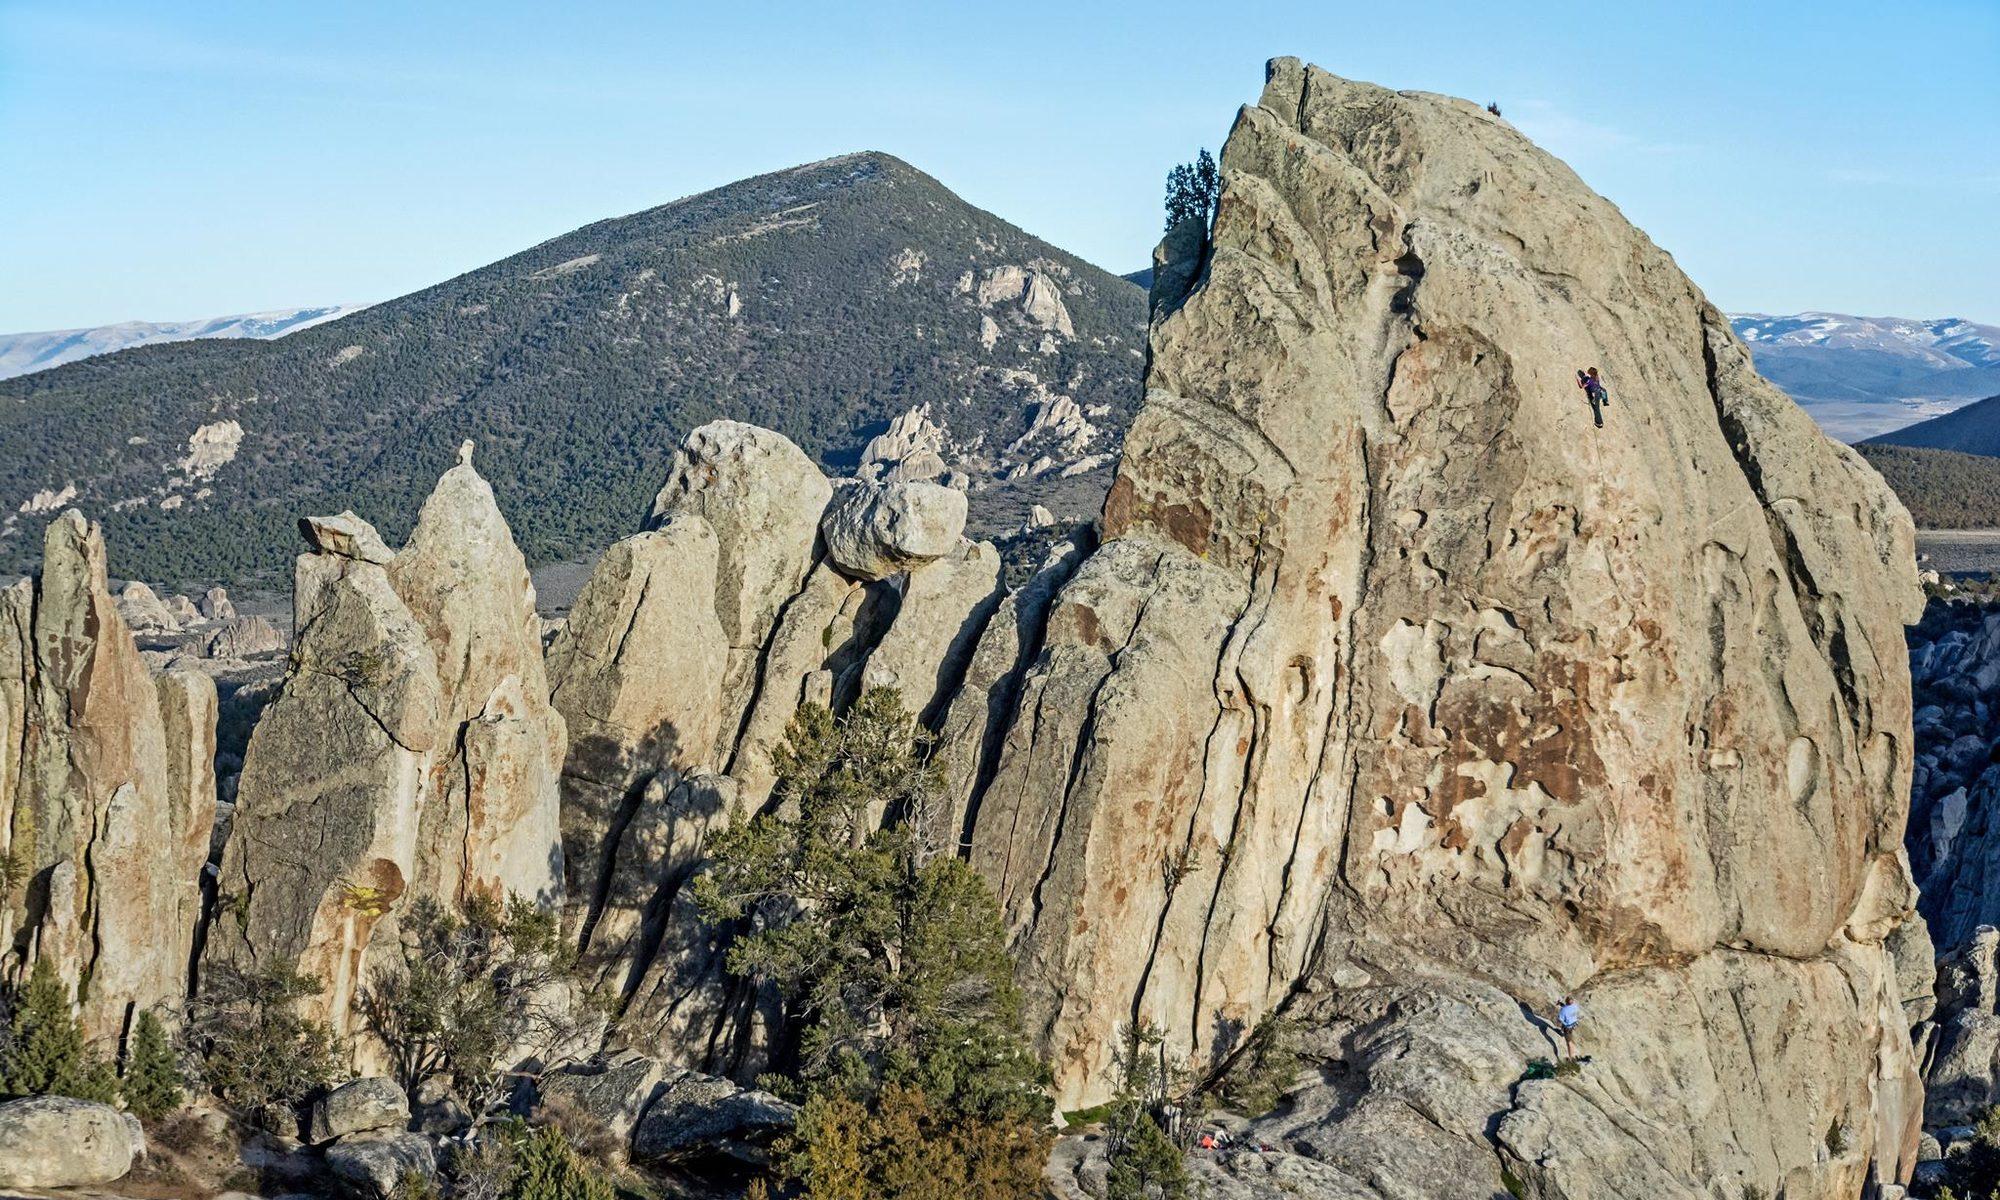 Southern Idaho Climbing Coaliton